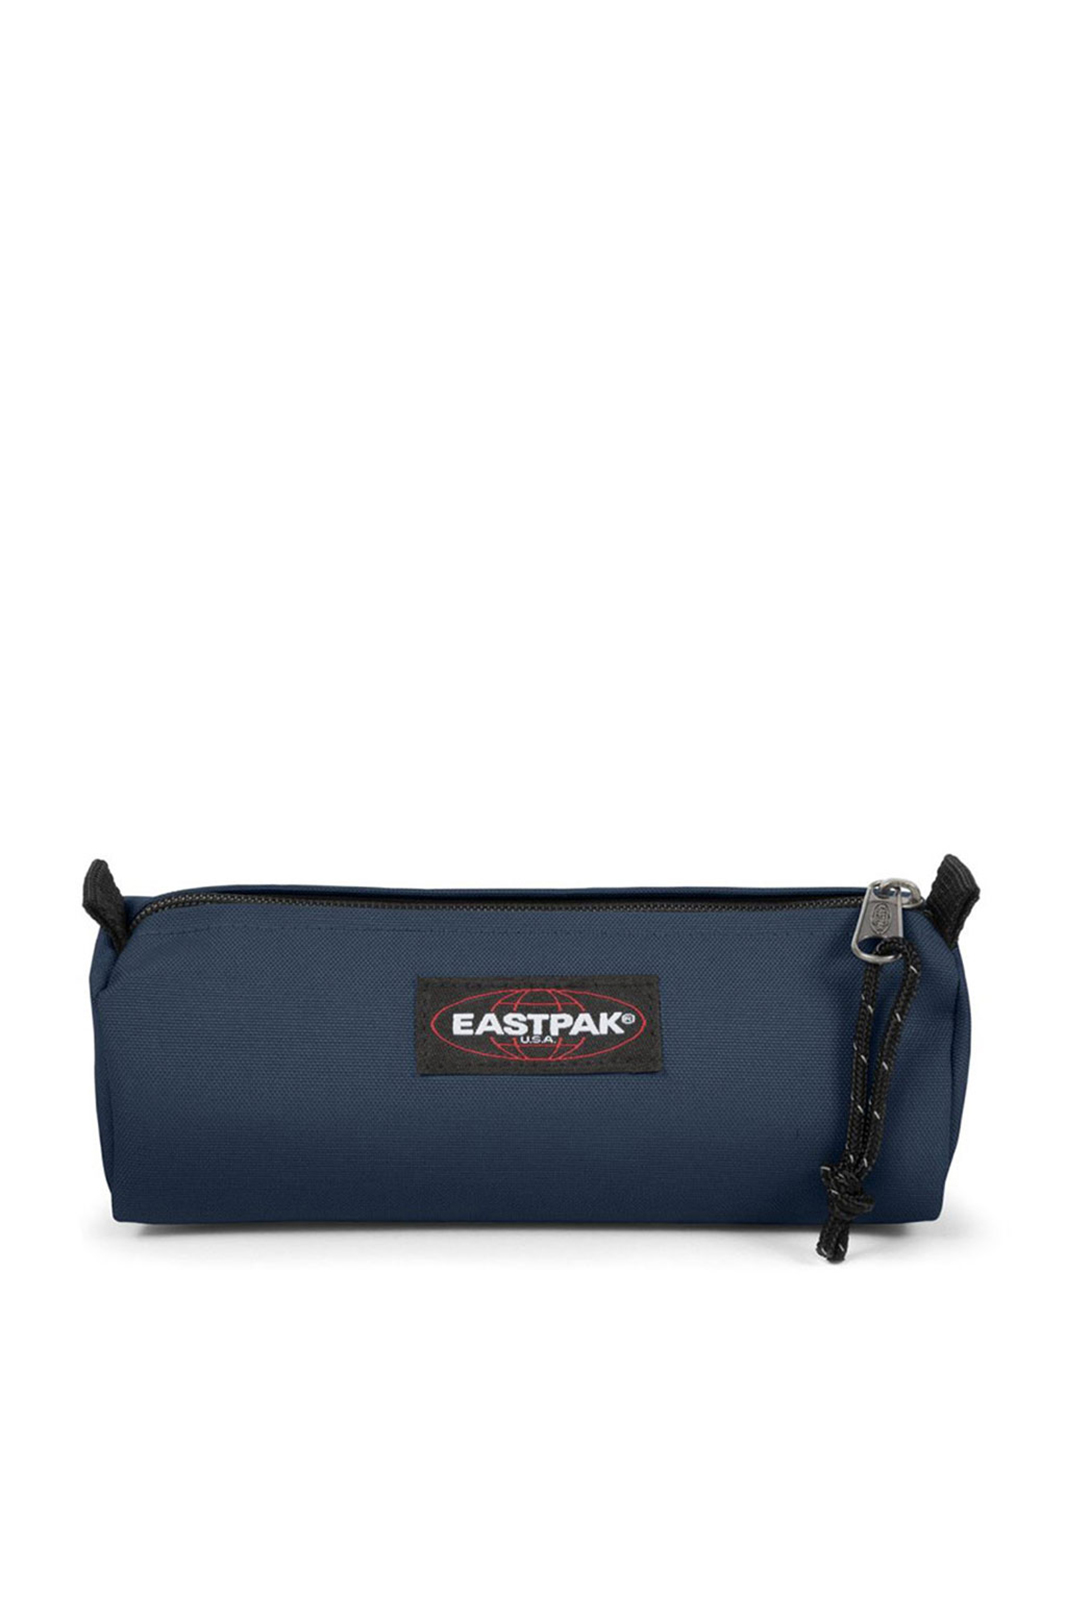 Etuis / Trousses  Eastpak EK372B64 B64 FROZEN NAVY